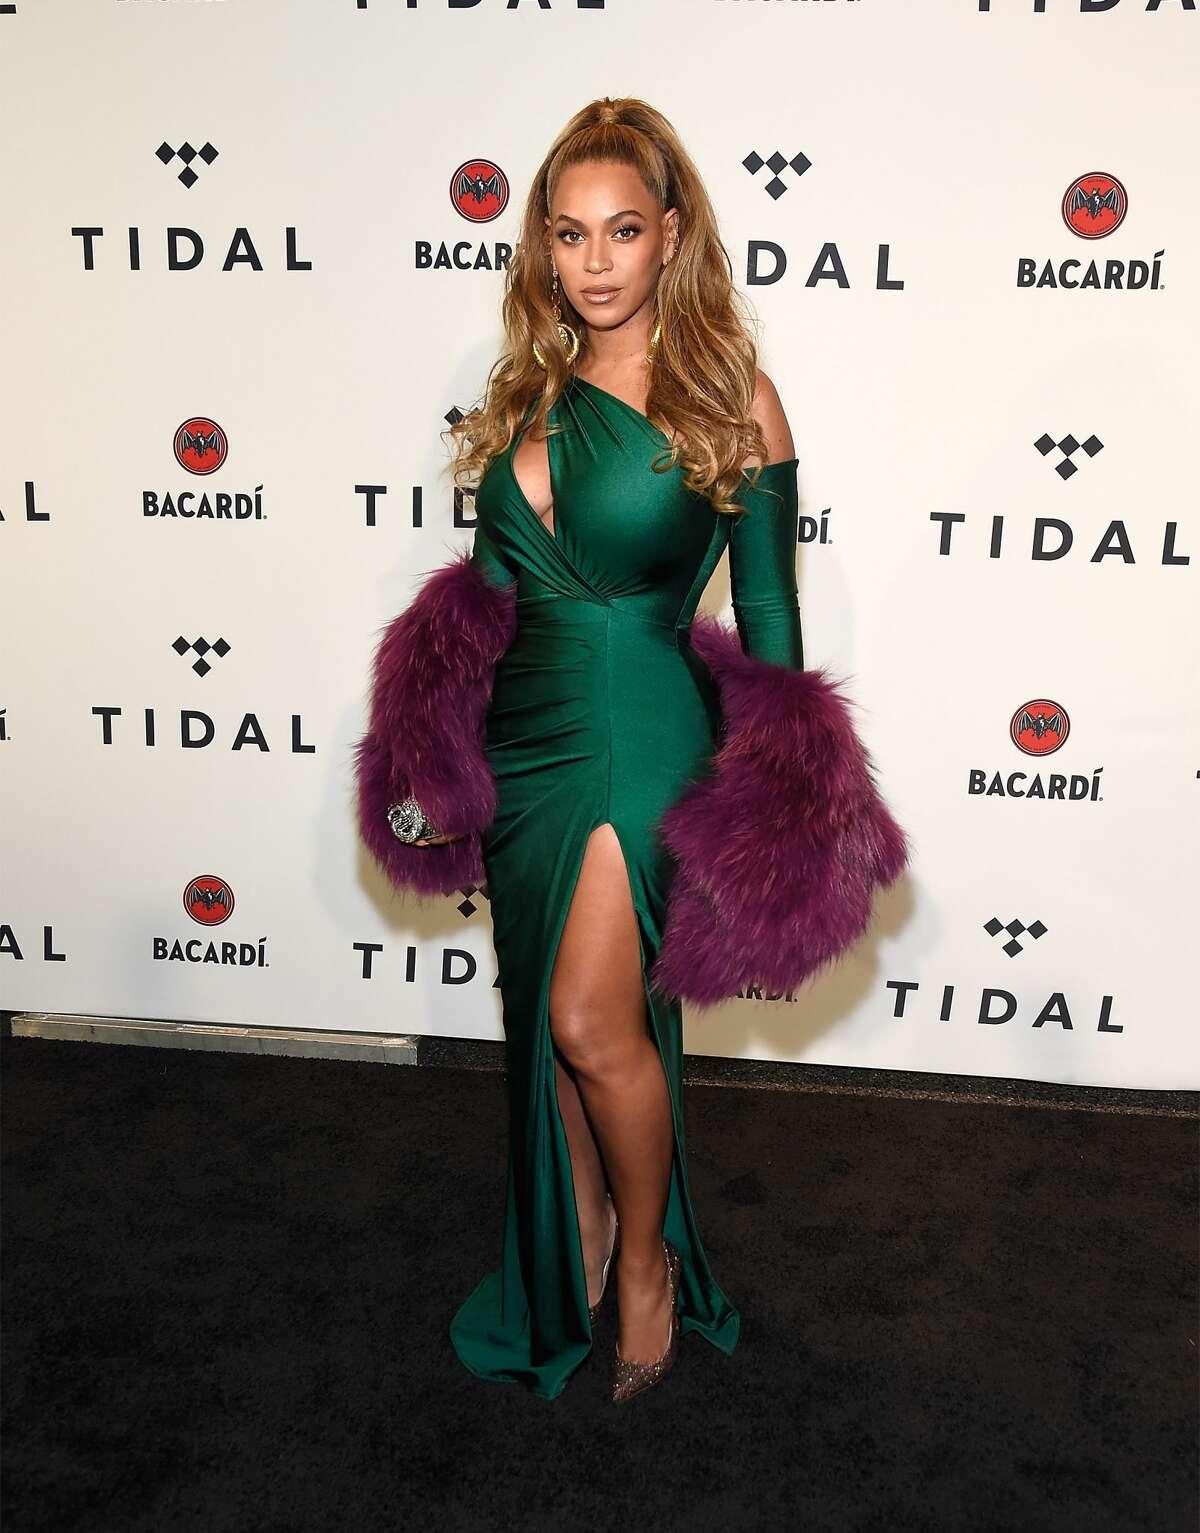 BeyonceBorn: Houston, 1981Known for: Destiny's Child, iconic singer